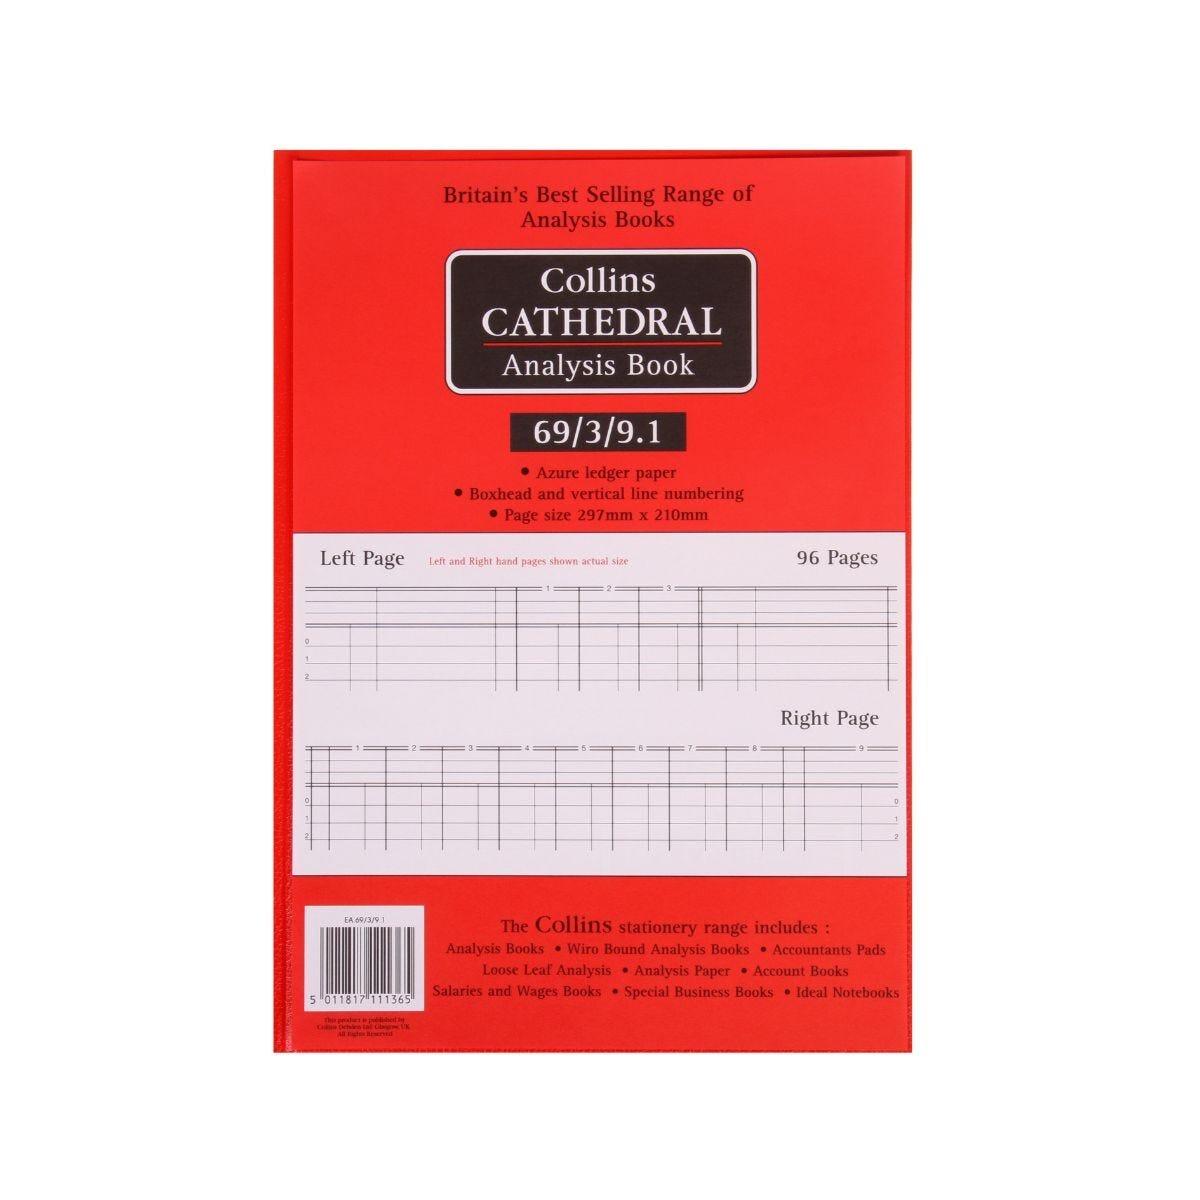 Collins Cathedral Analysis Book 69 Series 3 Debit 9 Credit Columns 69/3/9